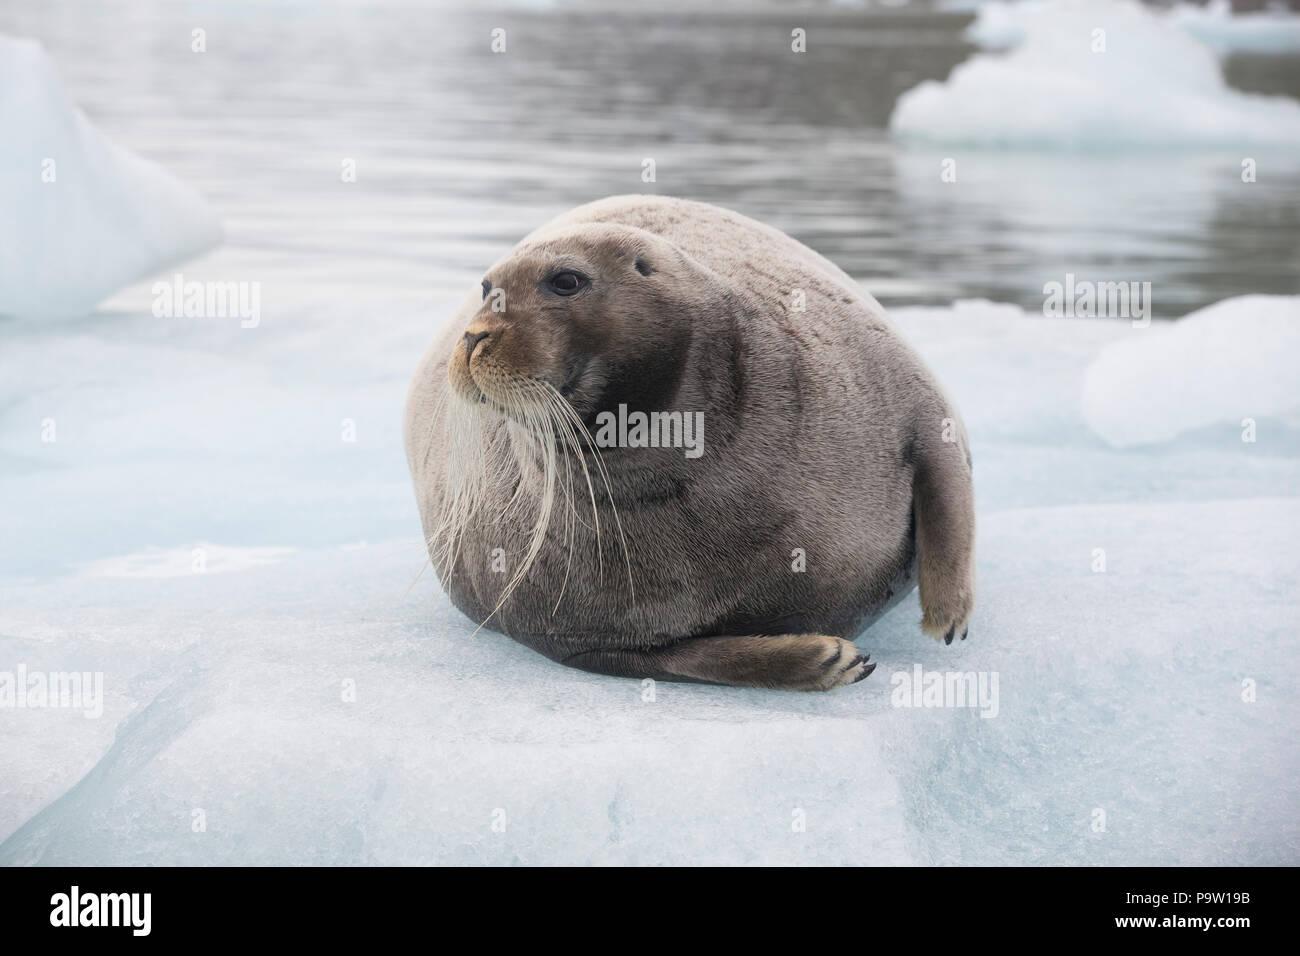 Bearded Seal (Erignathus barbatus) on an ice floe in Svalbard - Stock Image